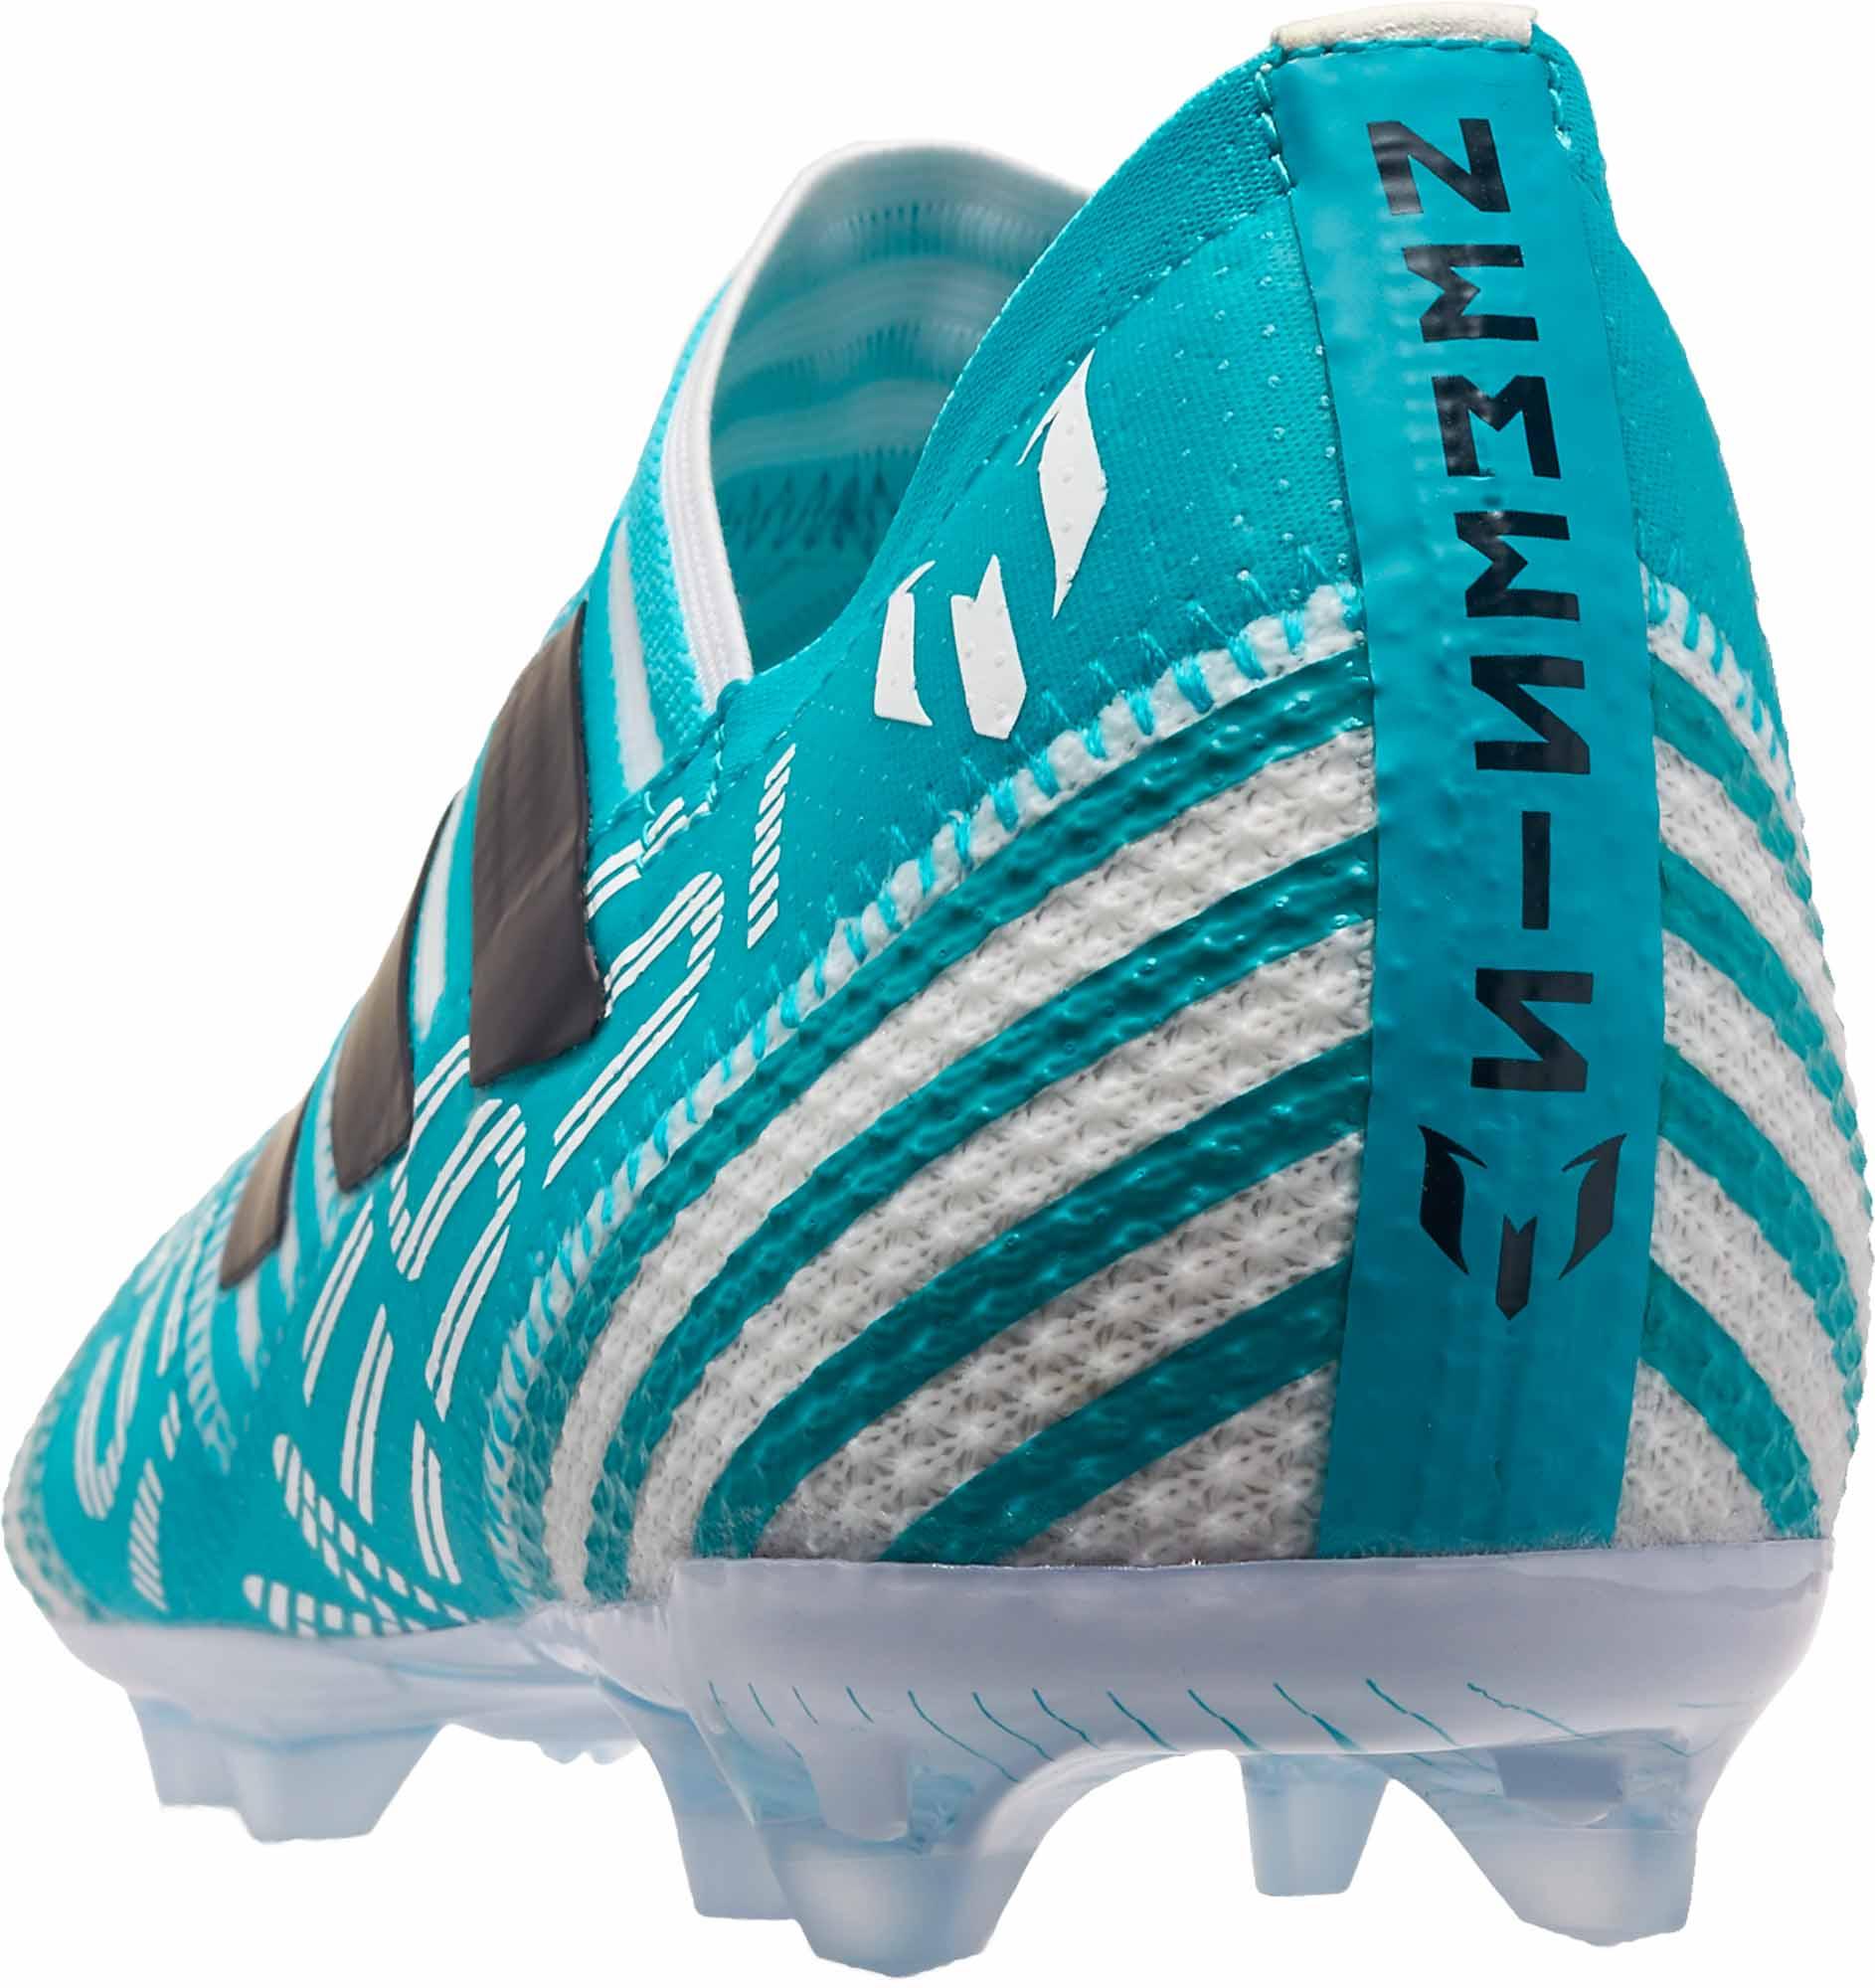 7c9f49f41e04 adidas Kids Nemeziz Messi 17 360Agility FG - White   Legend Ink